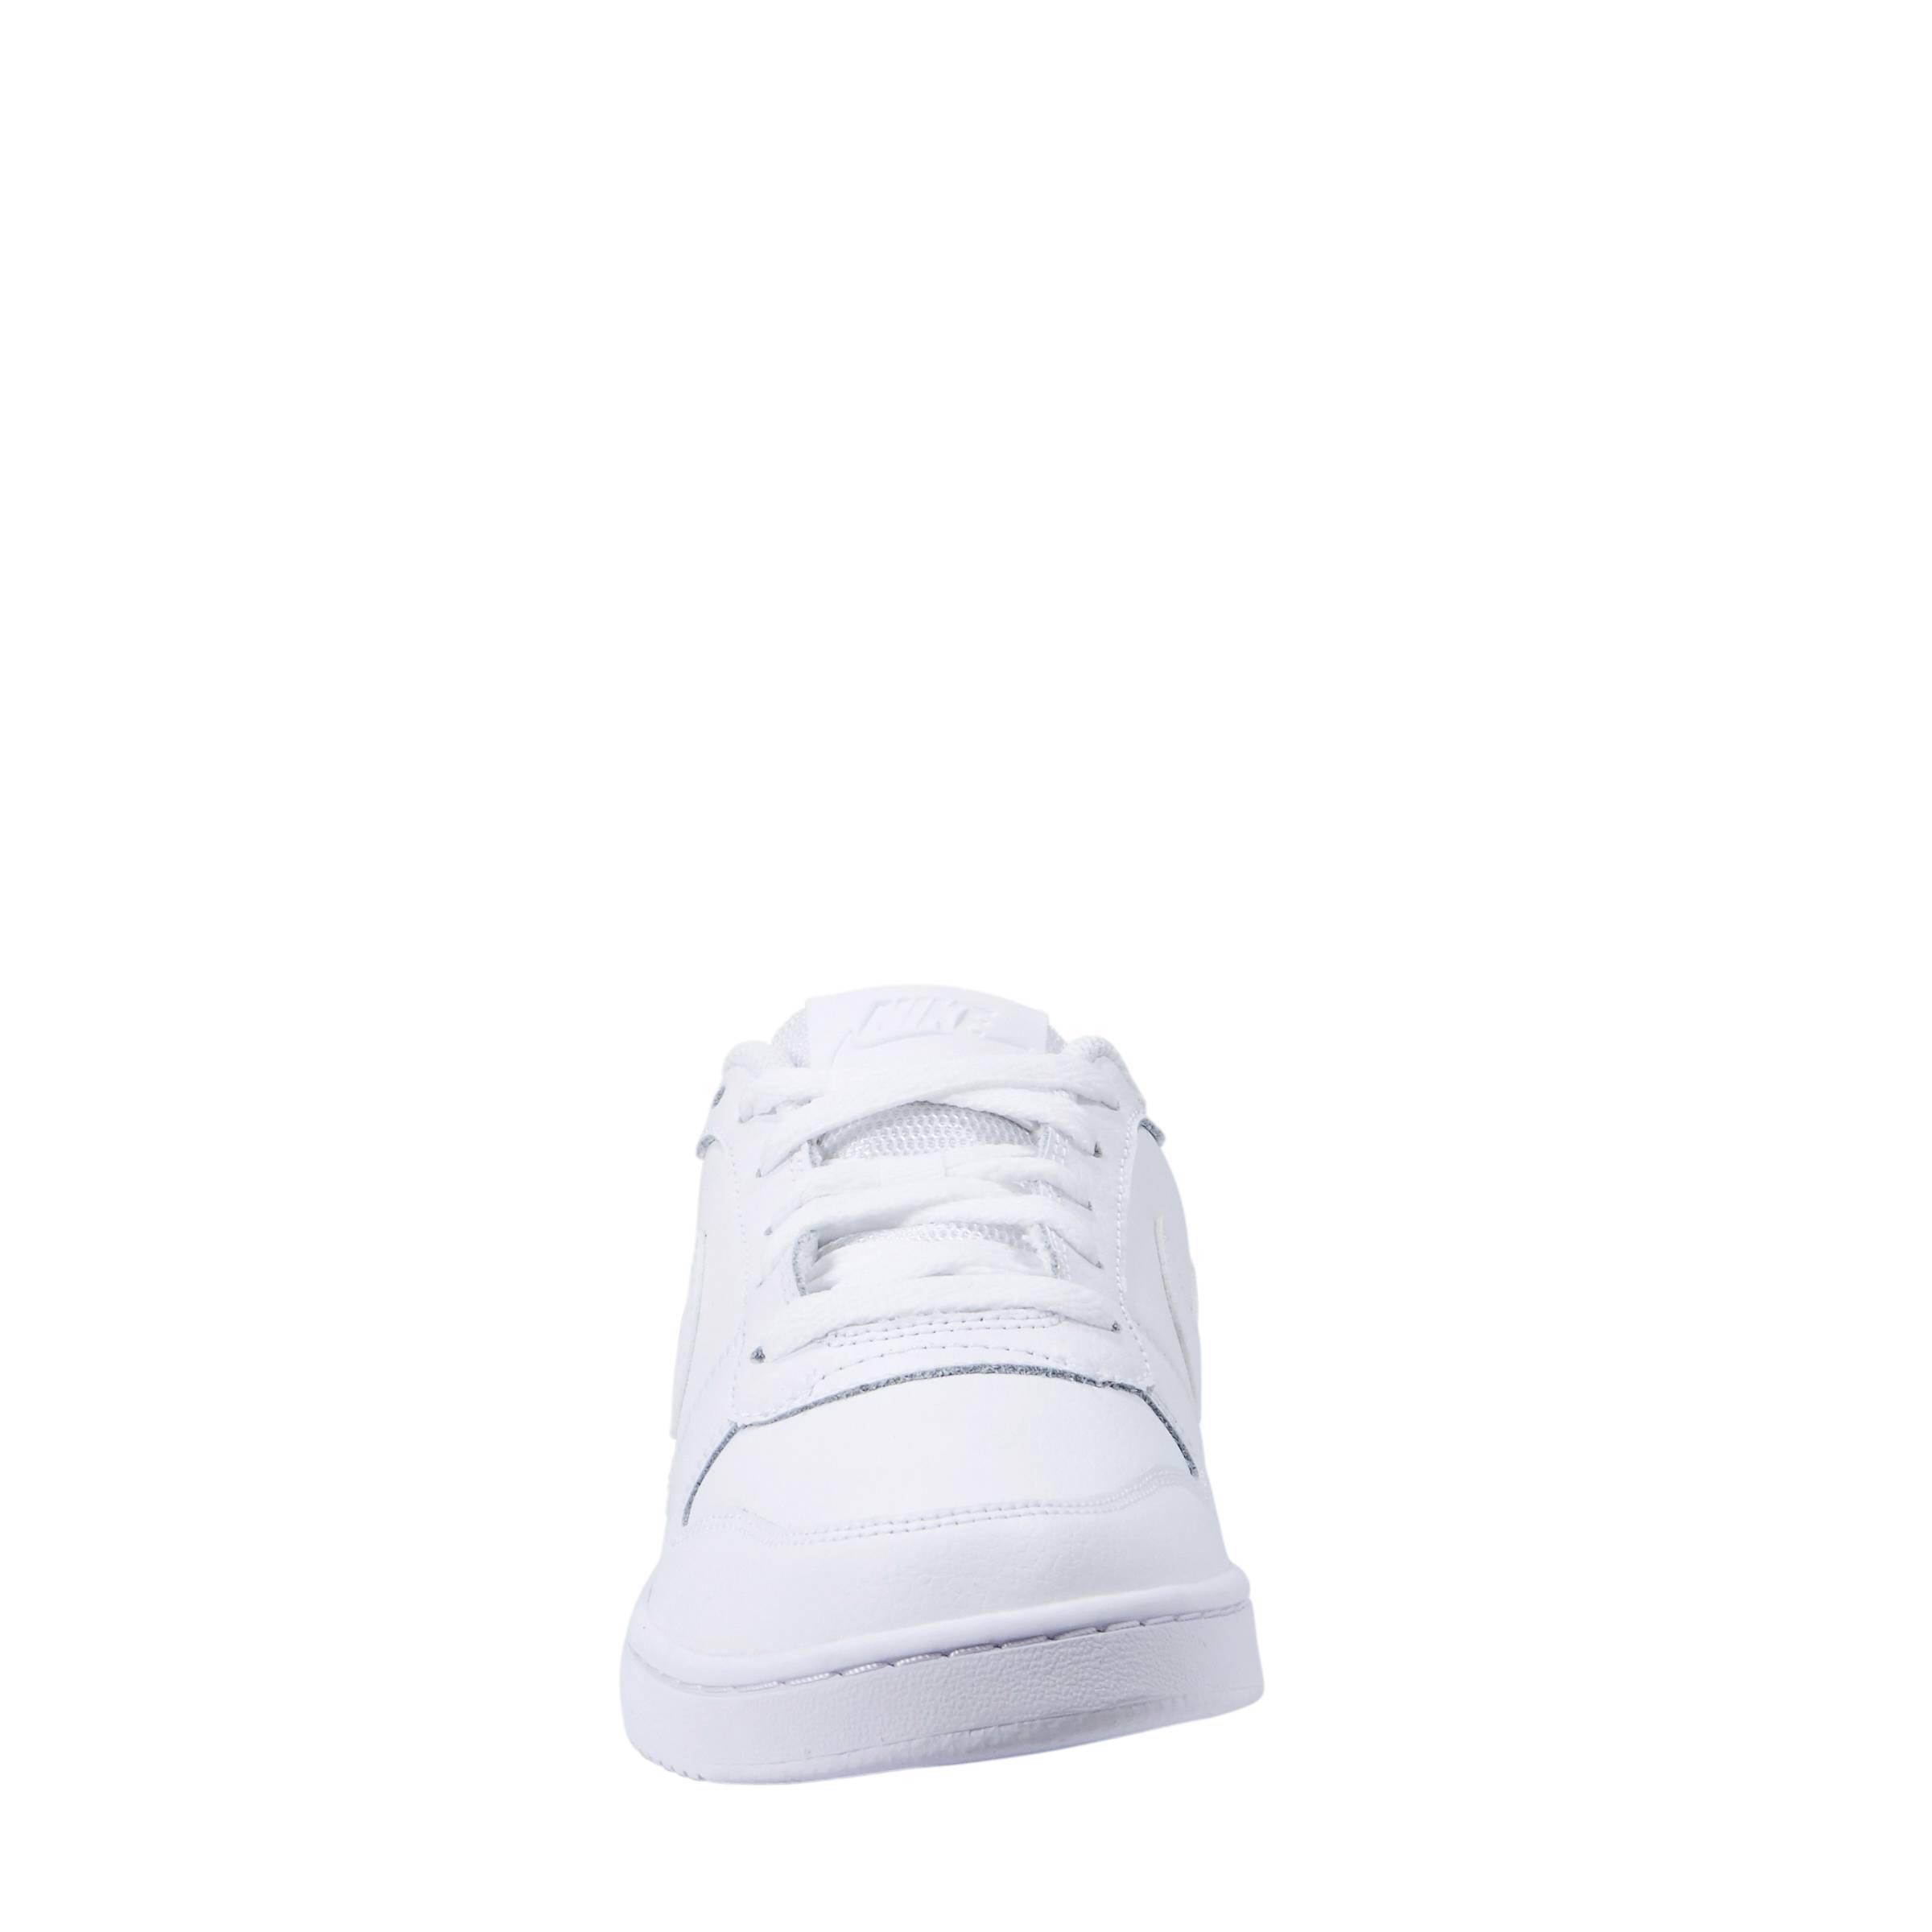 Nike Ebernon Low leren sneakers | wehkamp